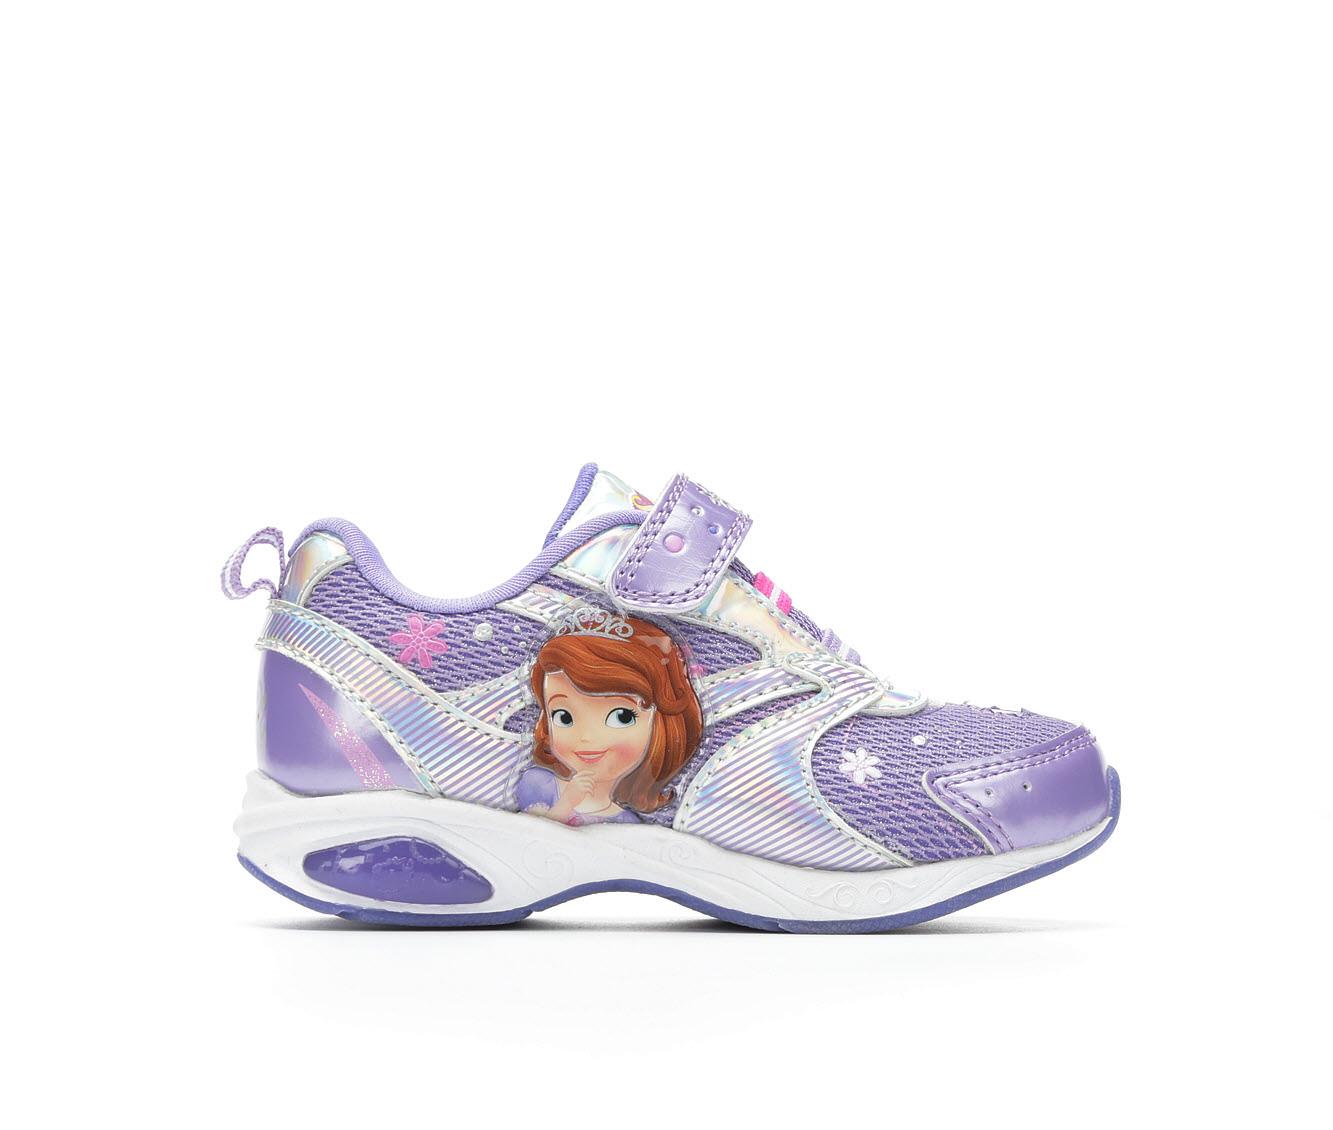 Girls' Disney Sofia 6 Children's Shoes (Purple)